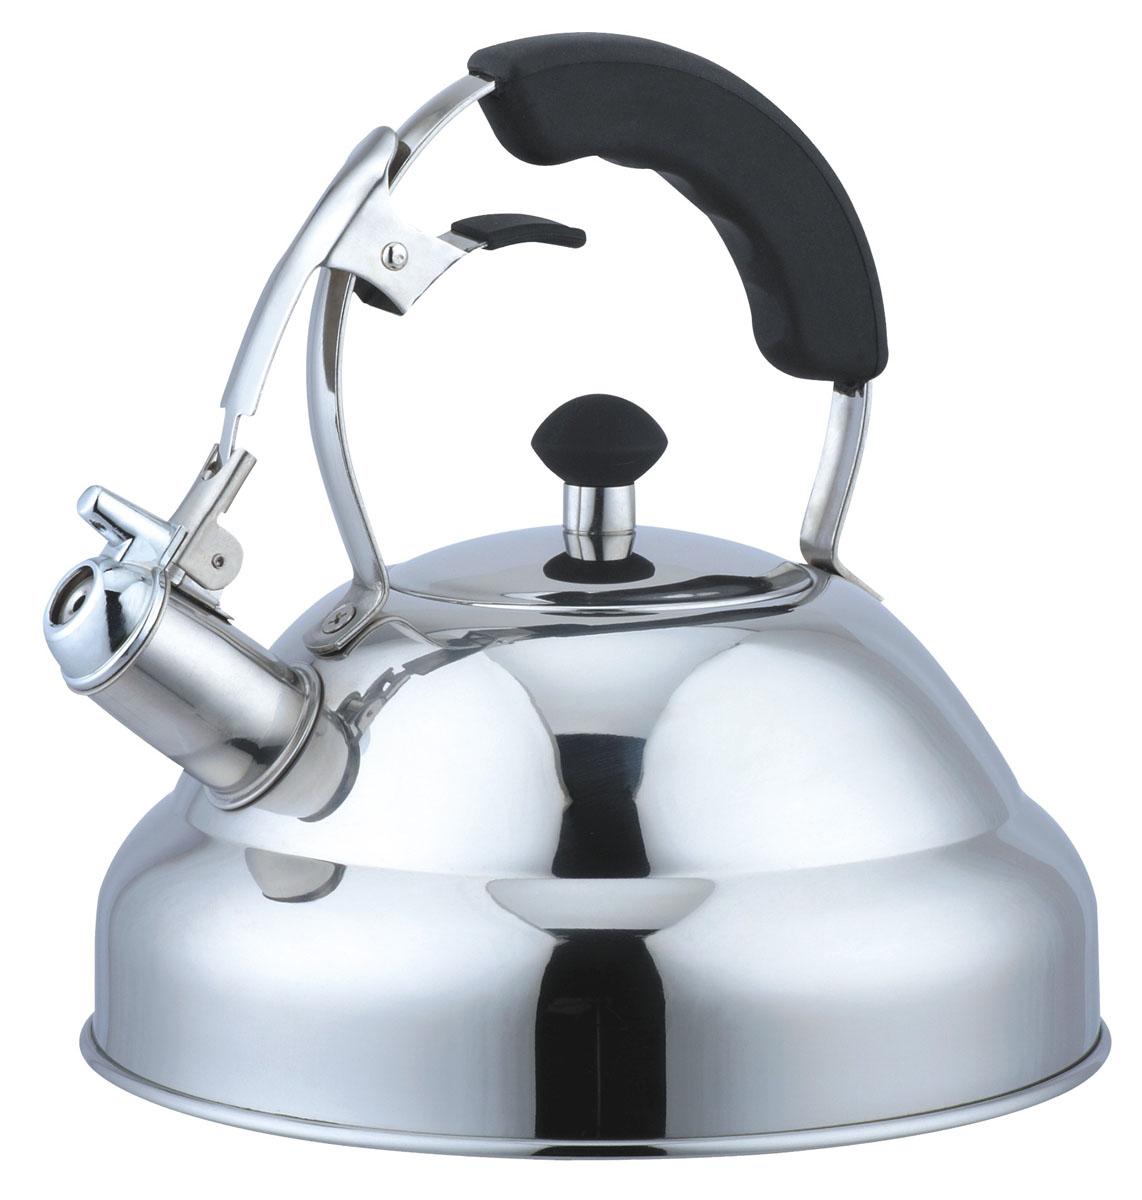 Чайник Bekker Koch со свистком, 3 л. BK-S453 термос bekker koch с помпой 2 5 л bk 4033